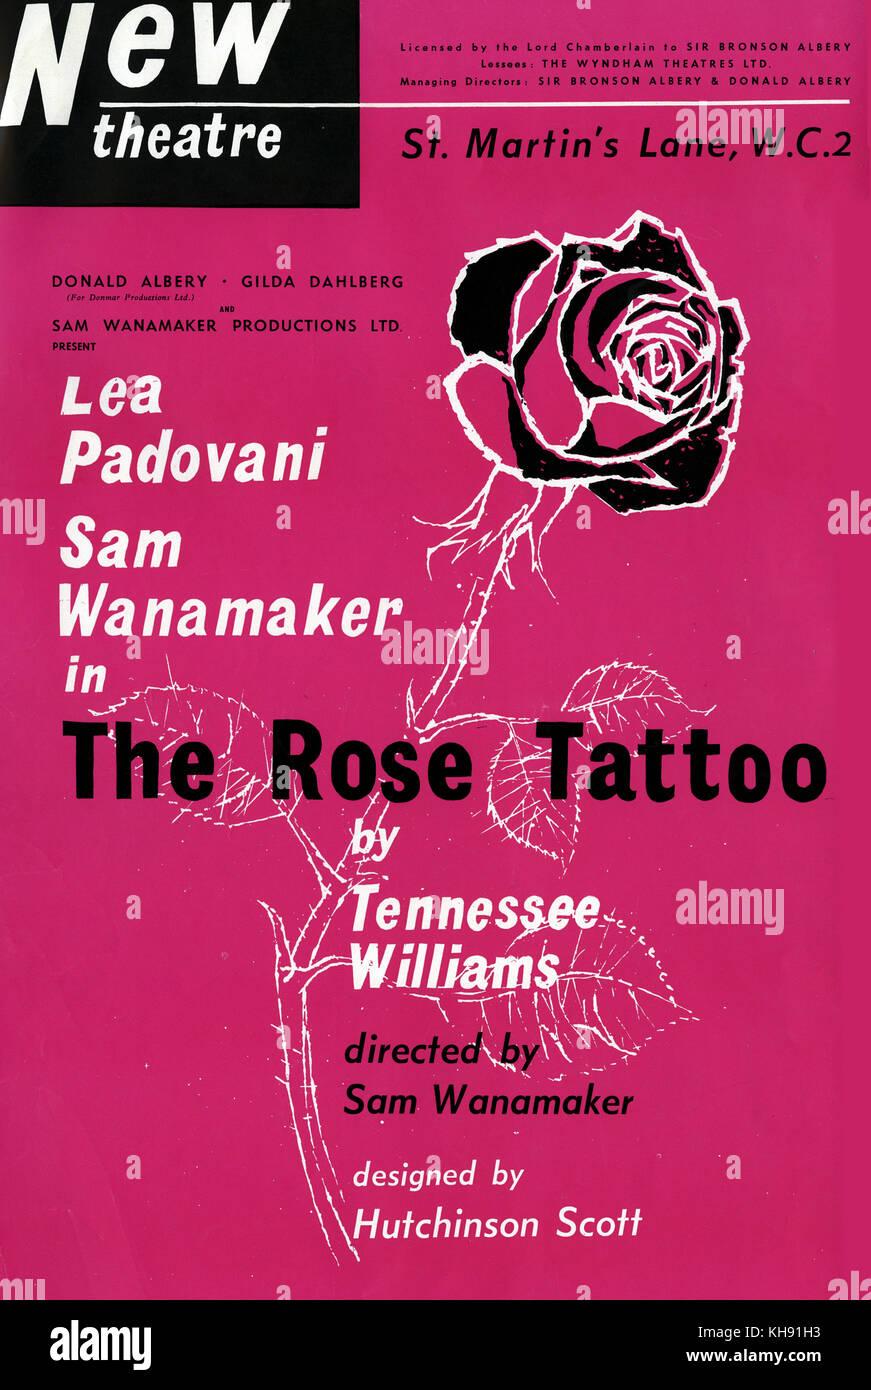 Sam wanamaker stock photos sam wanamaker stock images for The rose tattoo play